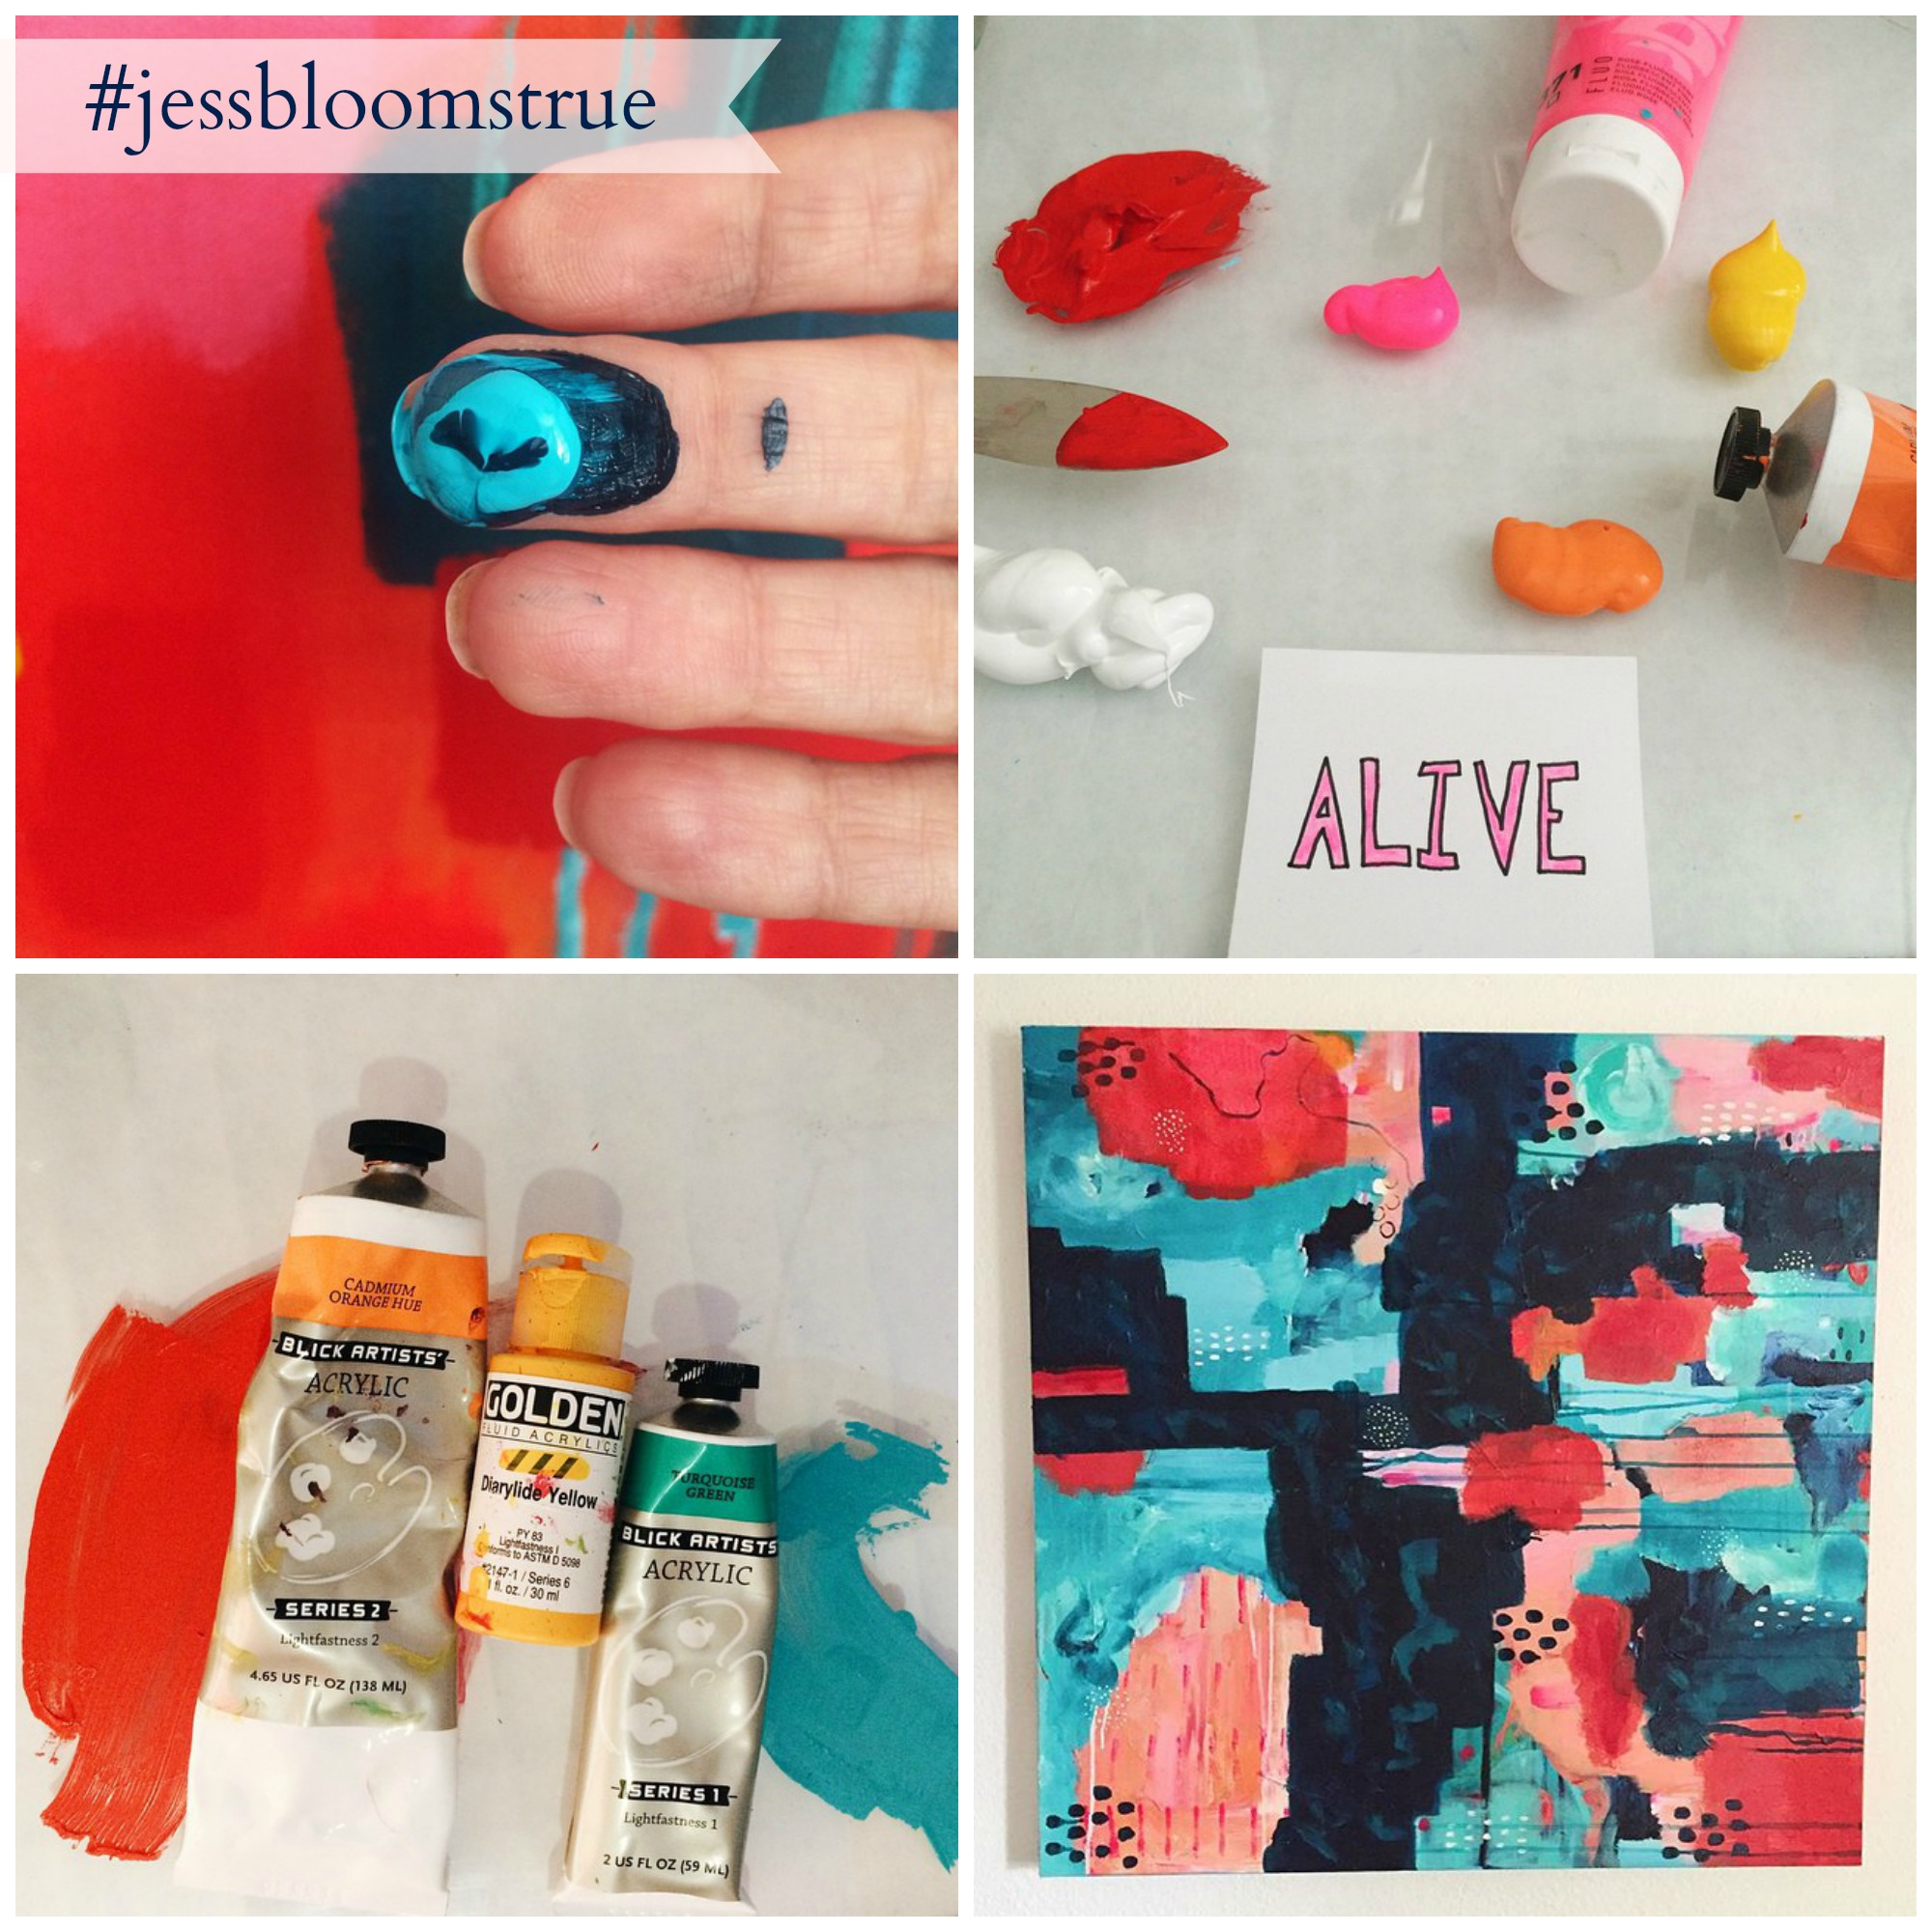 jess blooms true collage